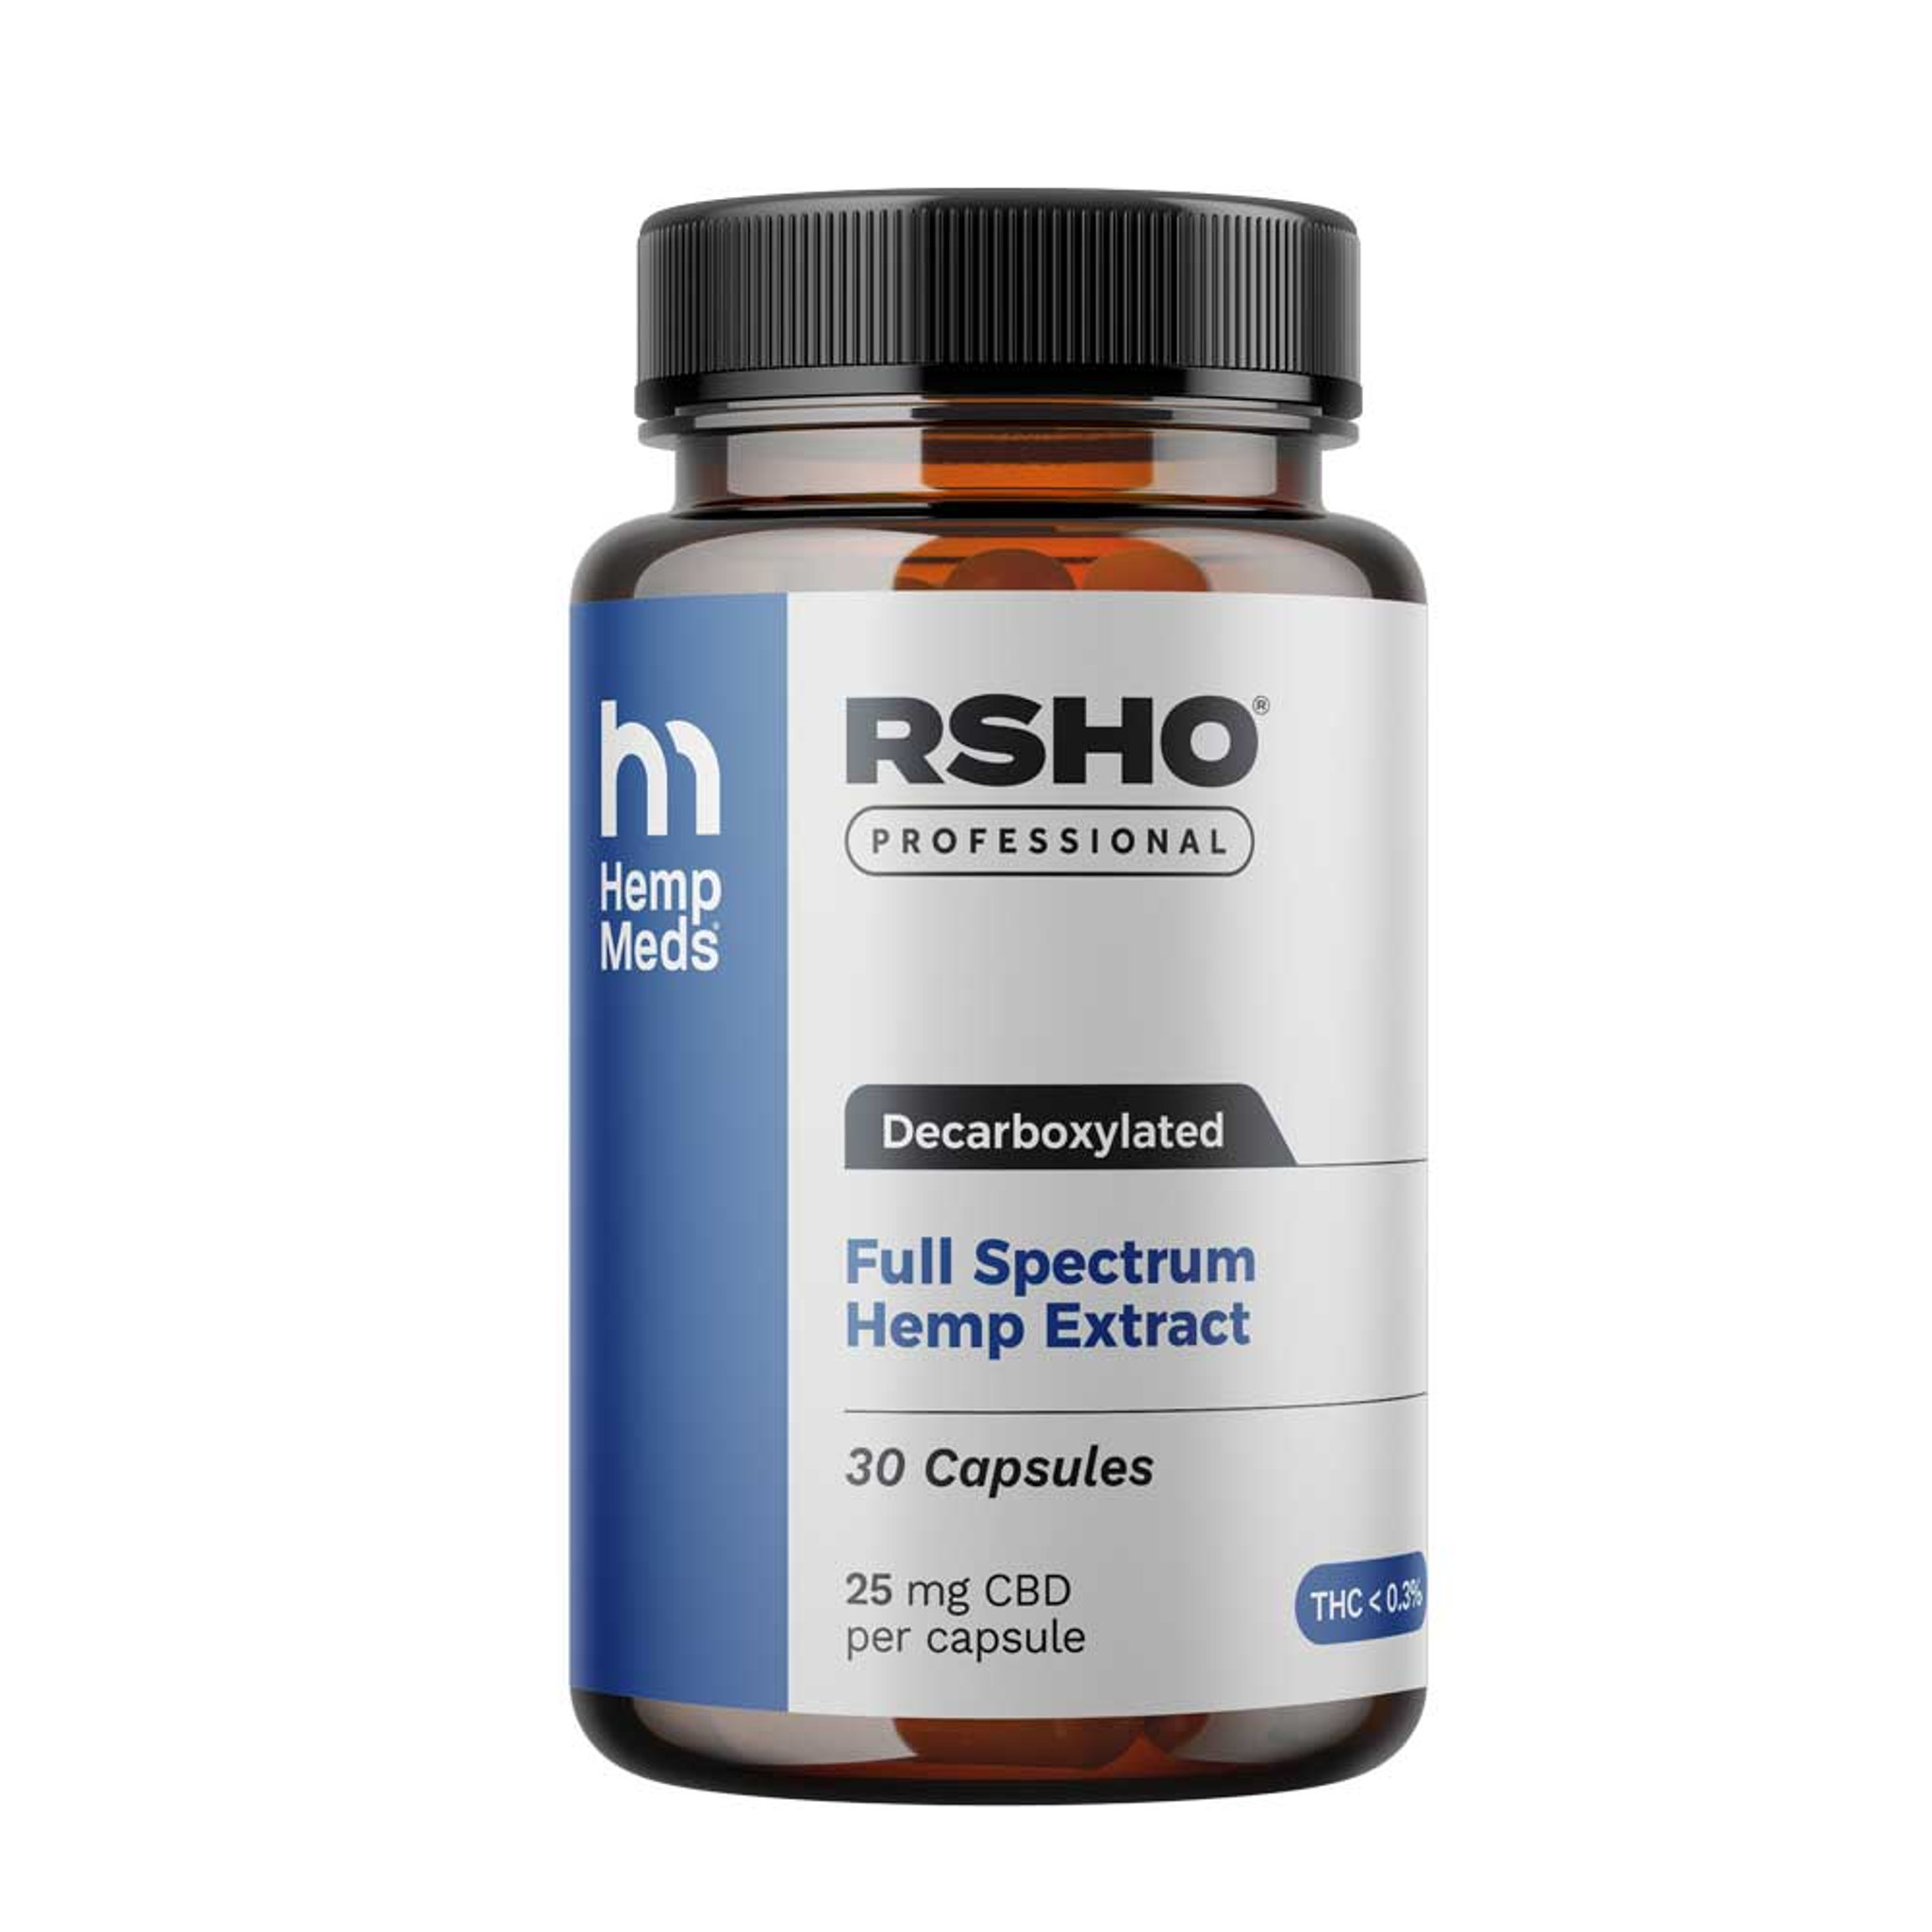 RSHO Pro Blue Label Capsules 25mg CBD 30CT (Heated)